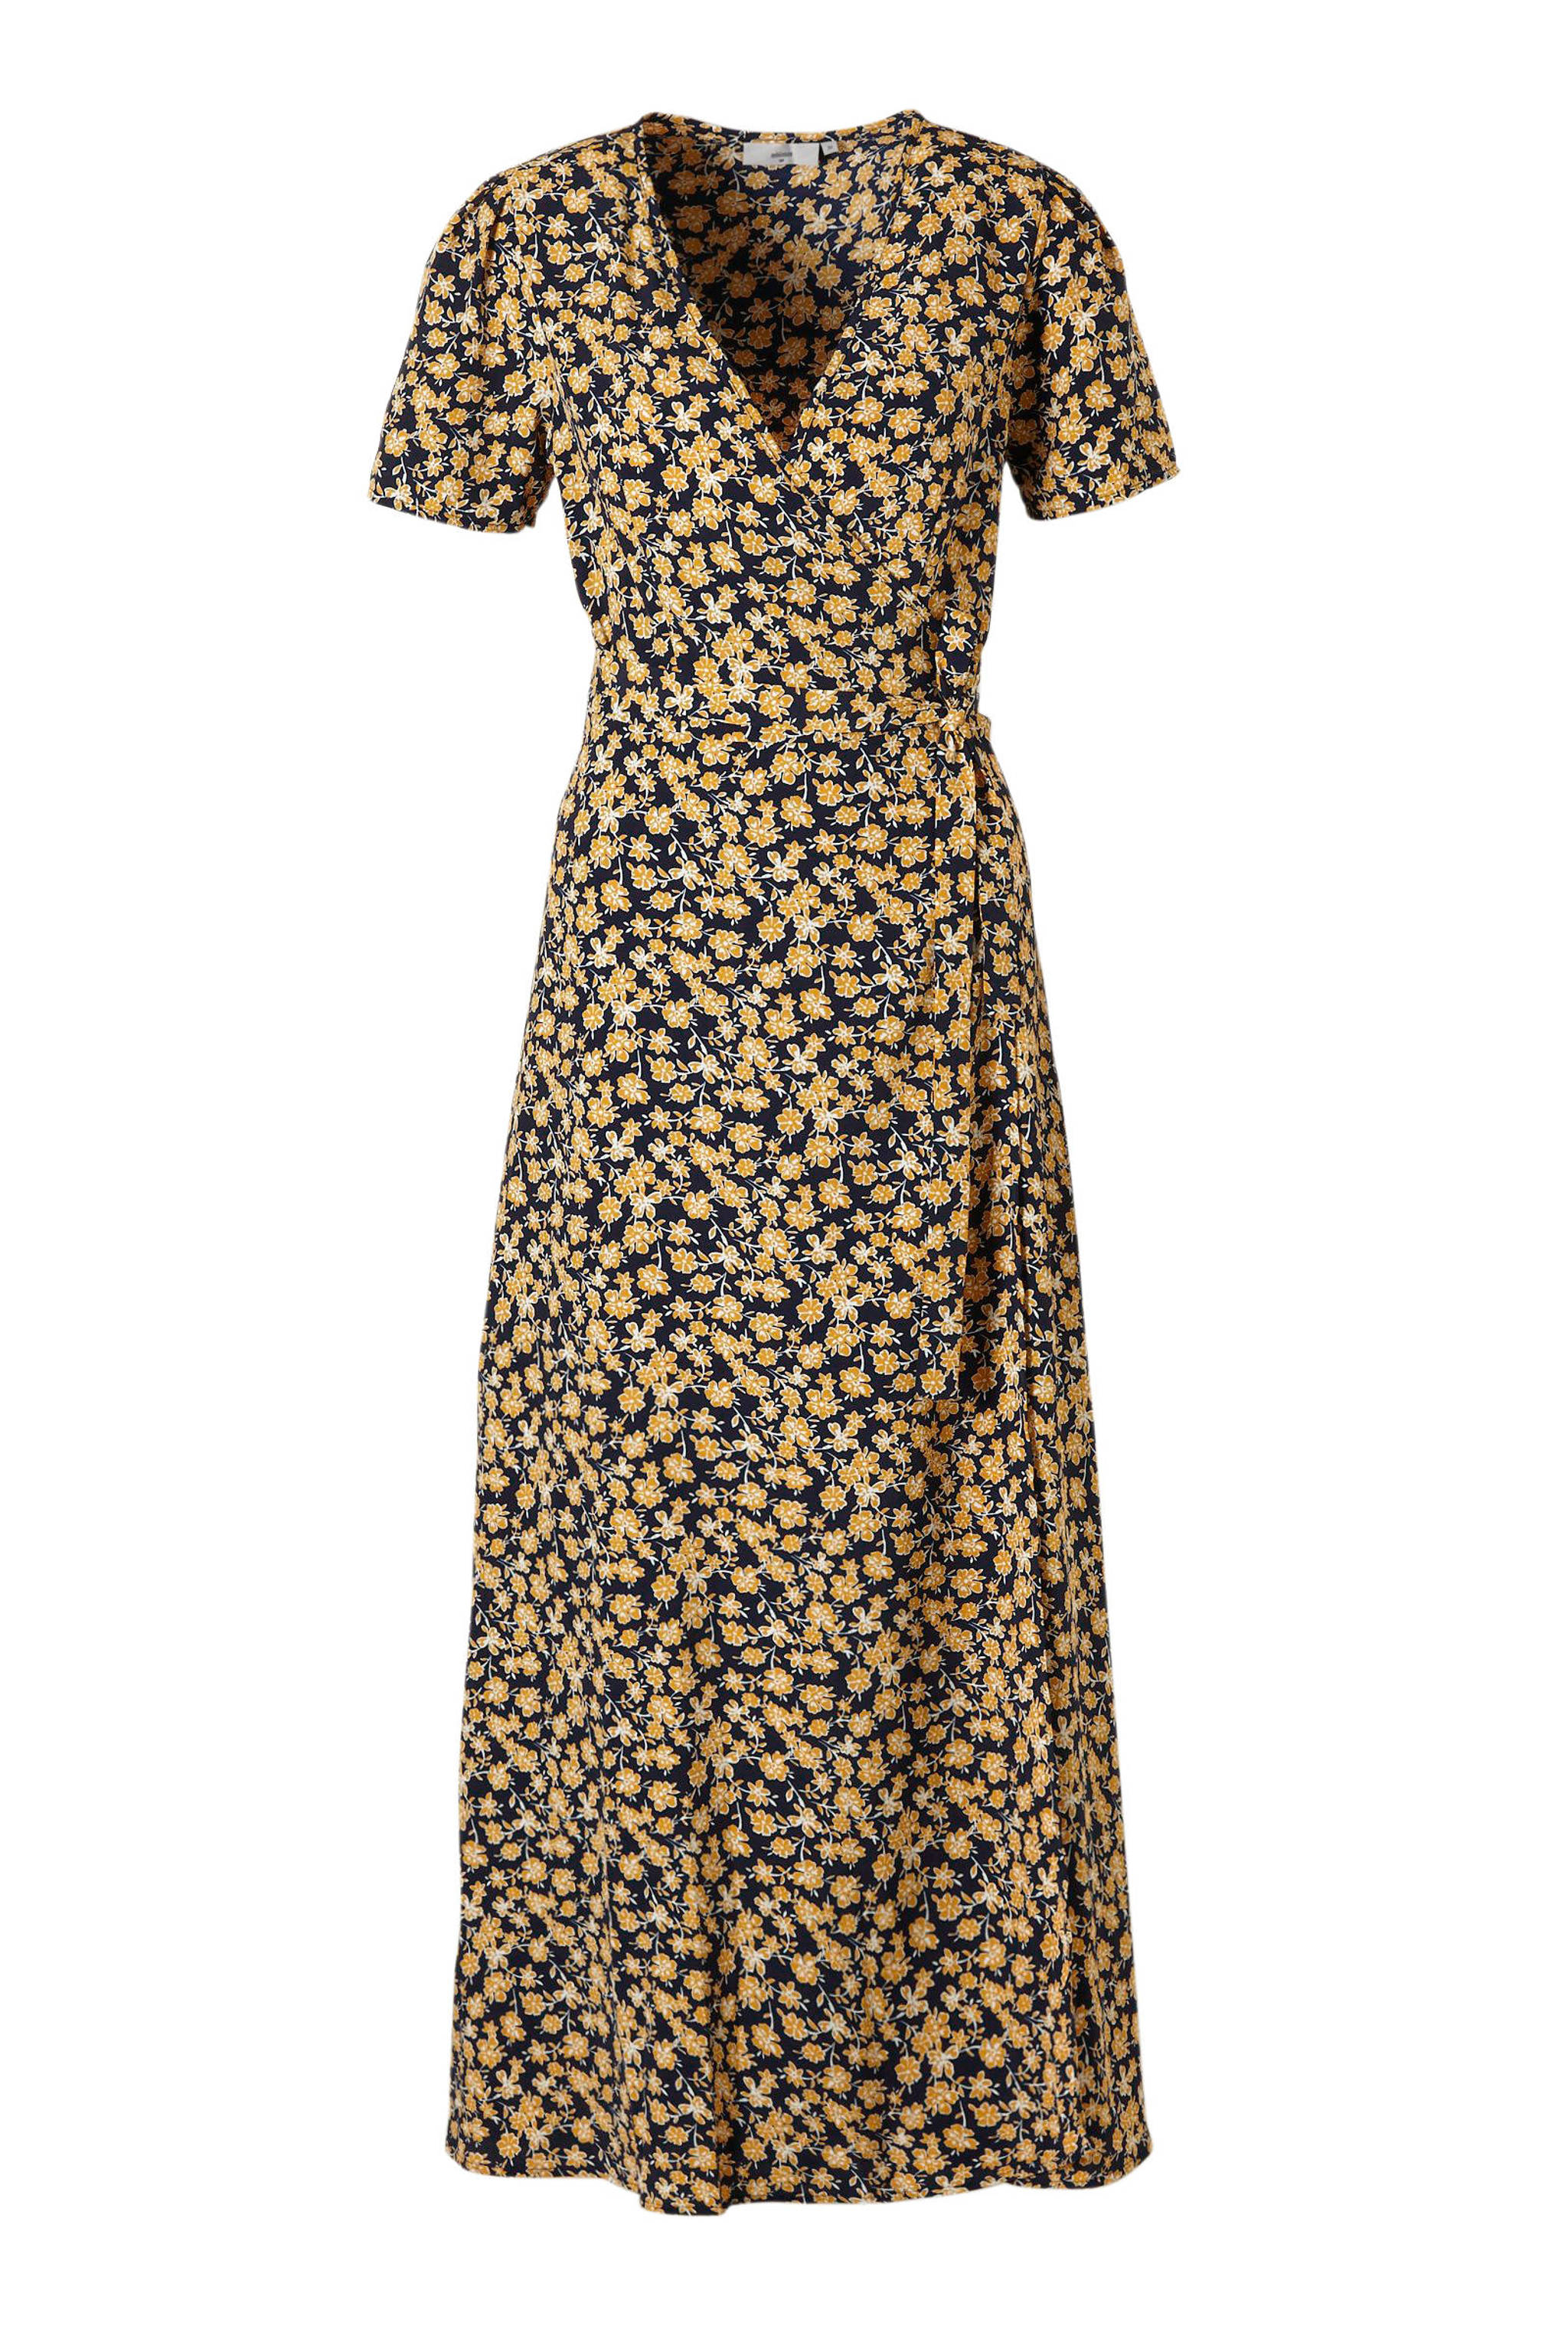 9e9643ed309b41 Minimum Elastica gebloemde overslag maxi jurk